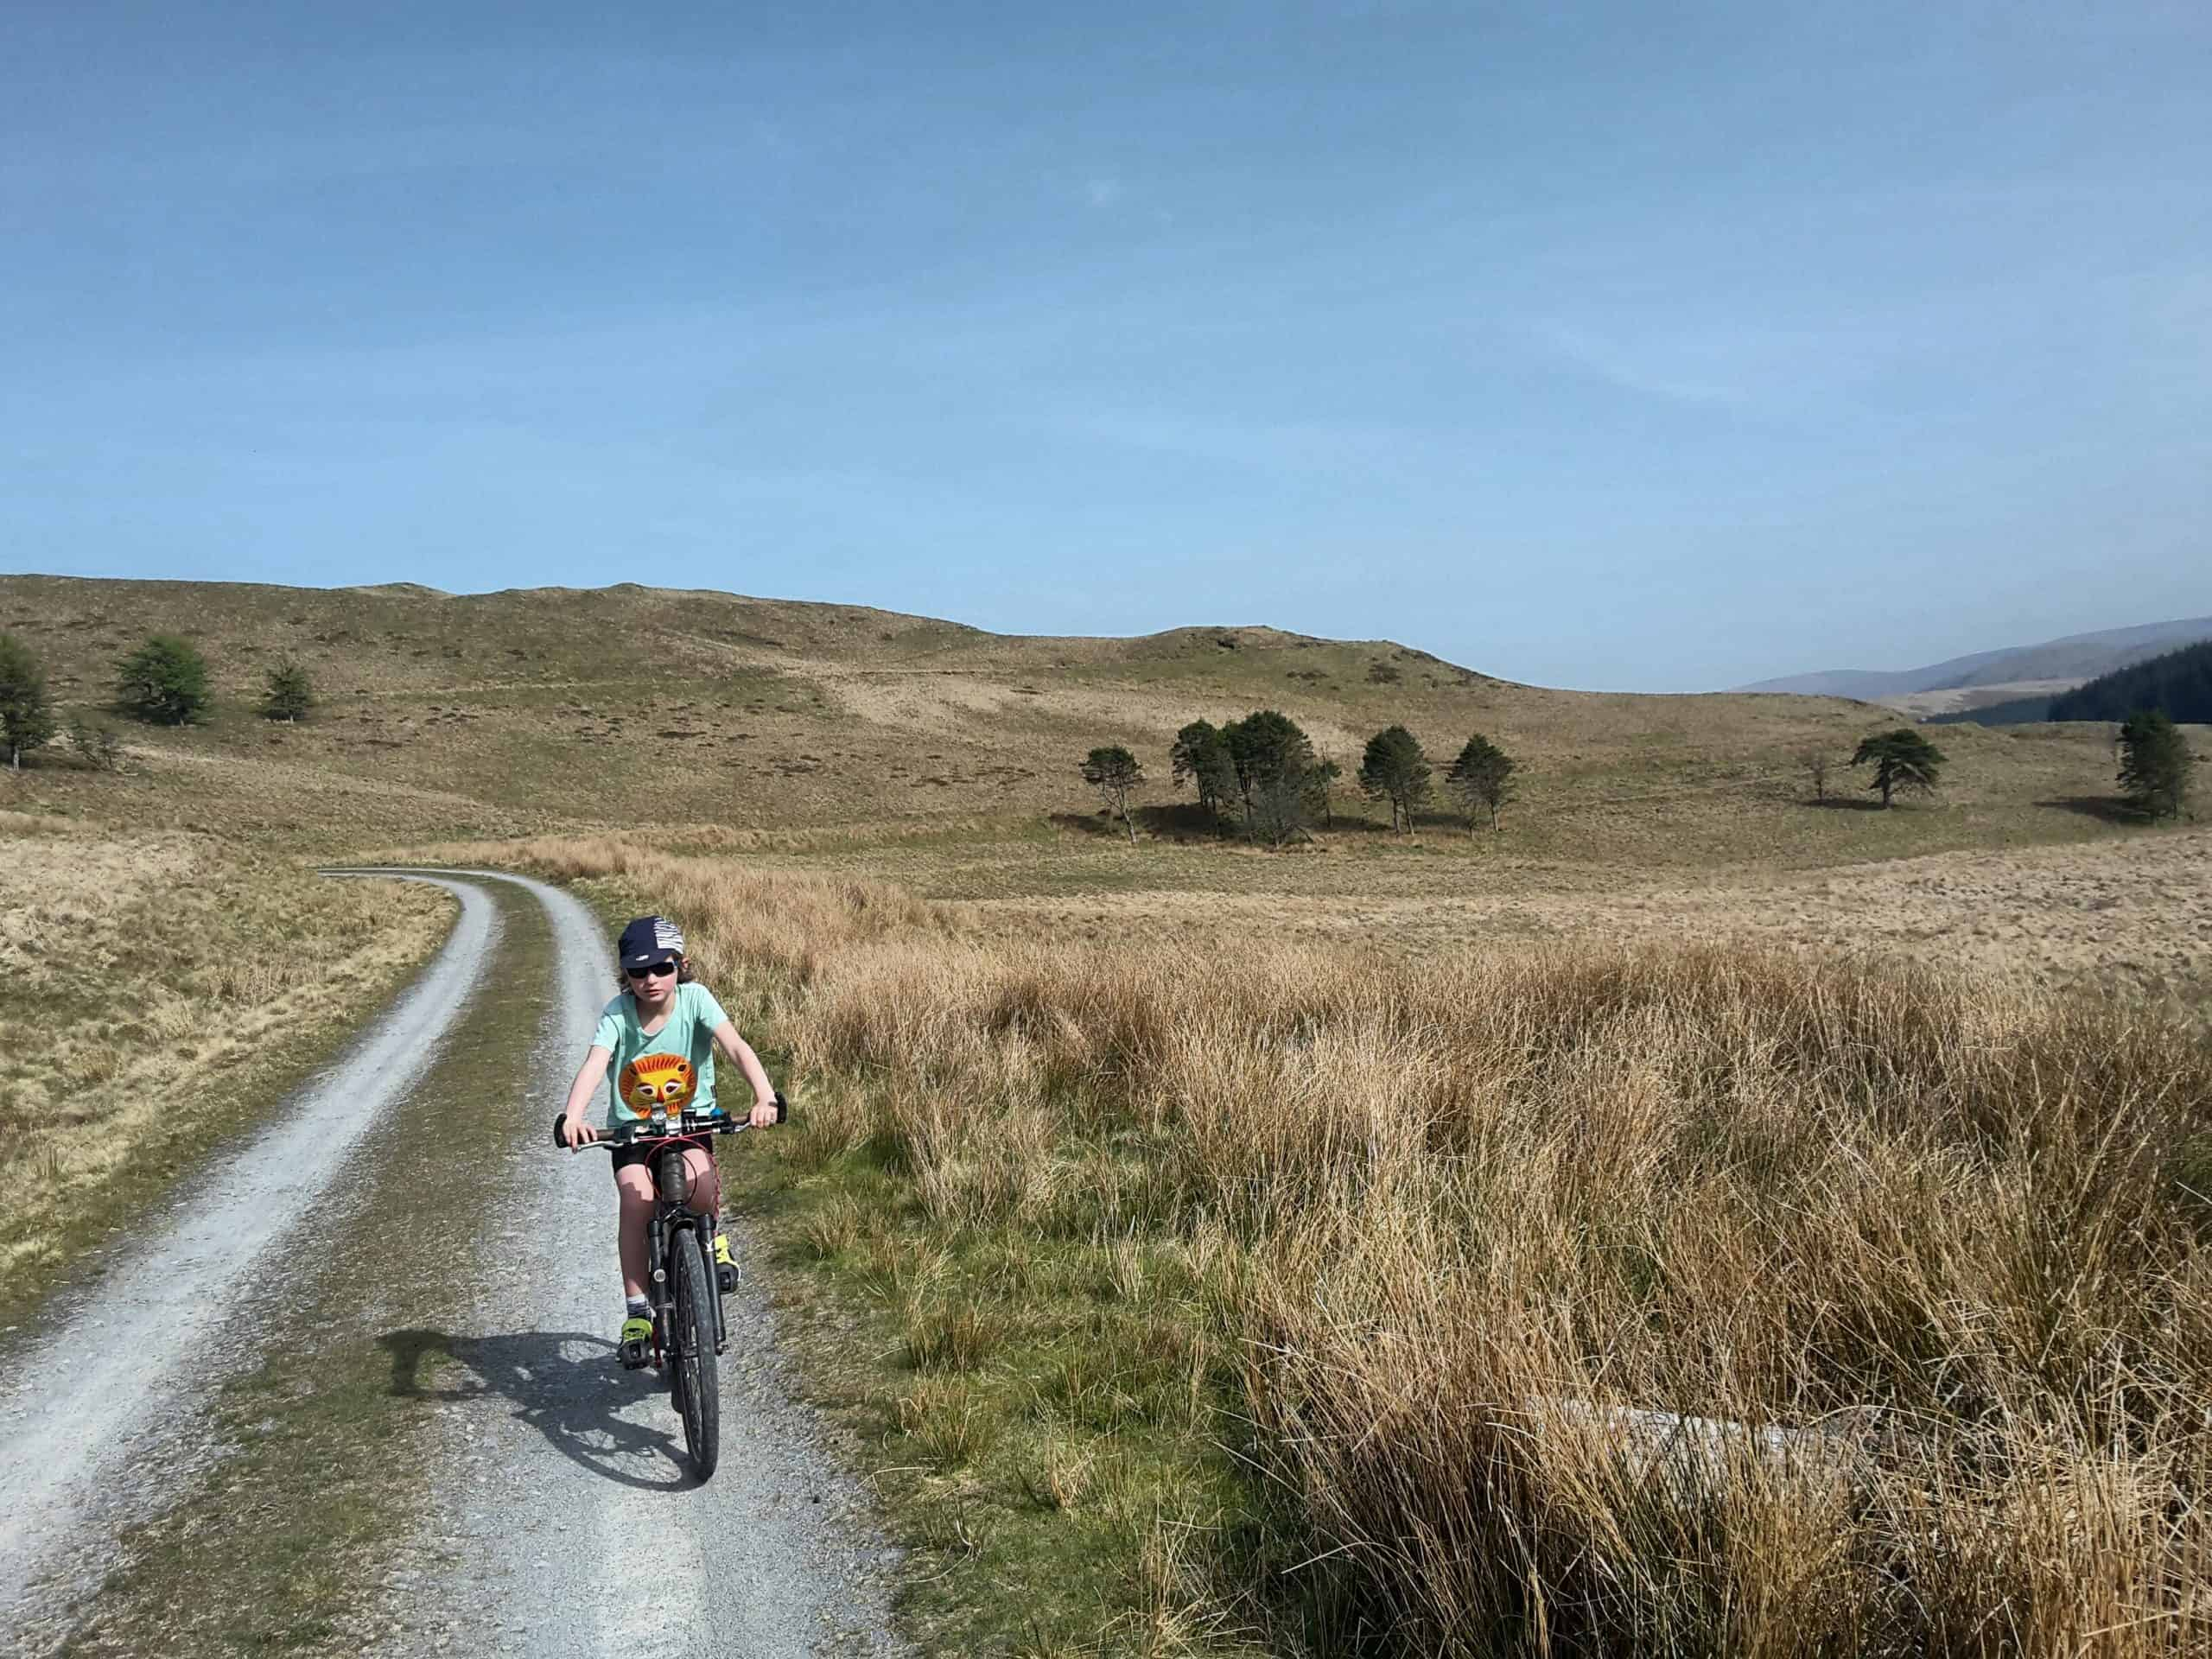 Snowdonia: Climbing Up, Riding Back 99